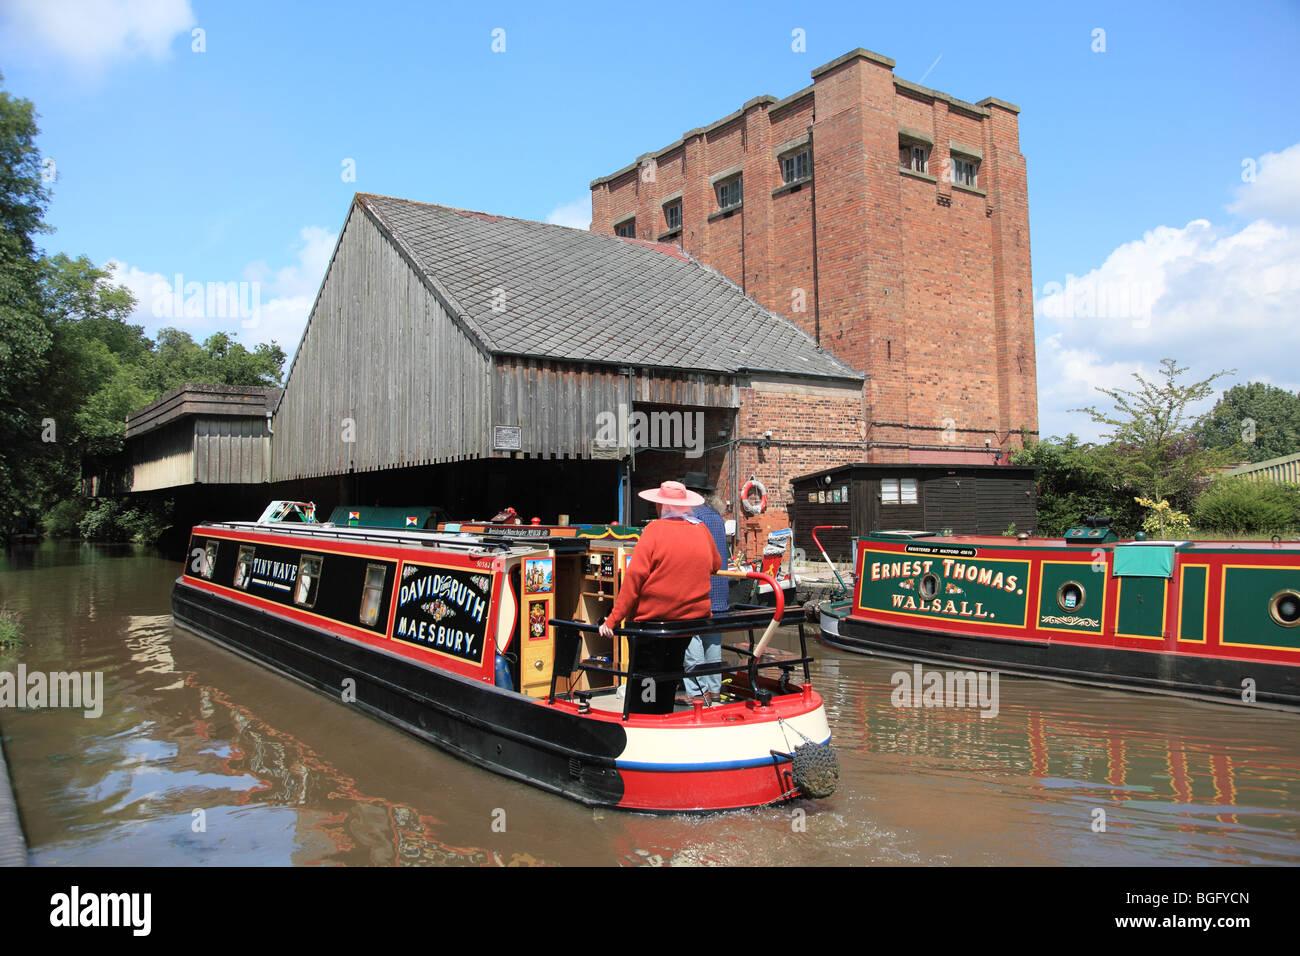 Cadbury's Wharf at Knighton, Staffordshire on the Shropshire Union Canal - Stock Image